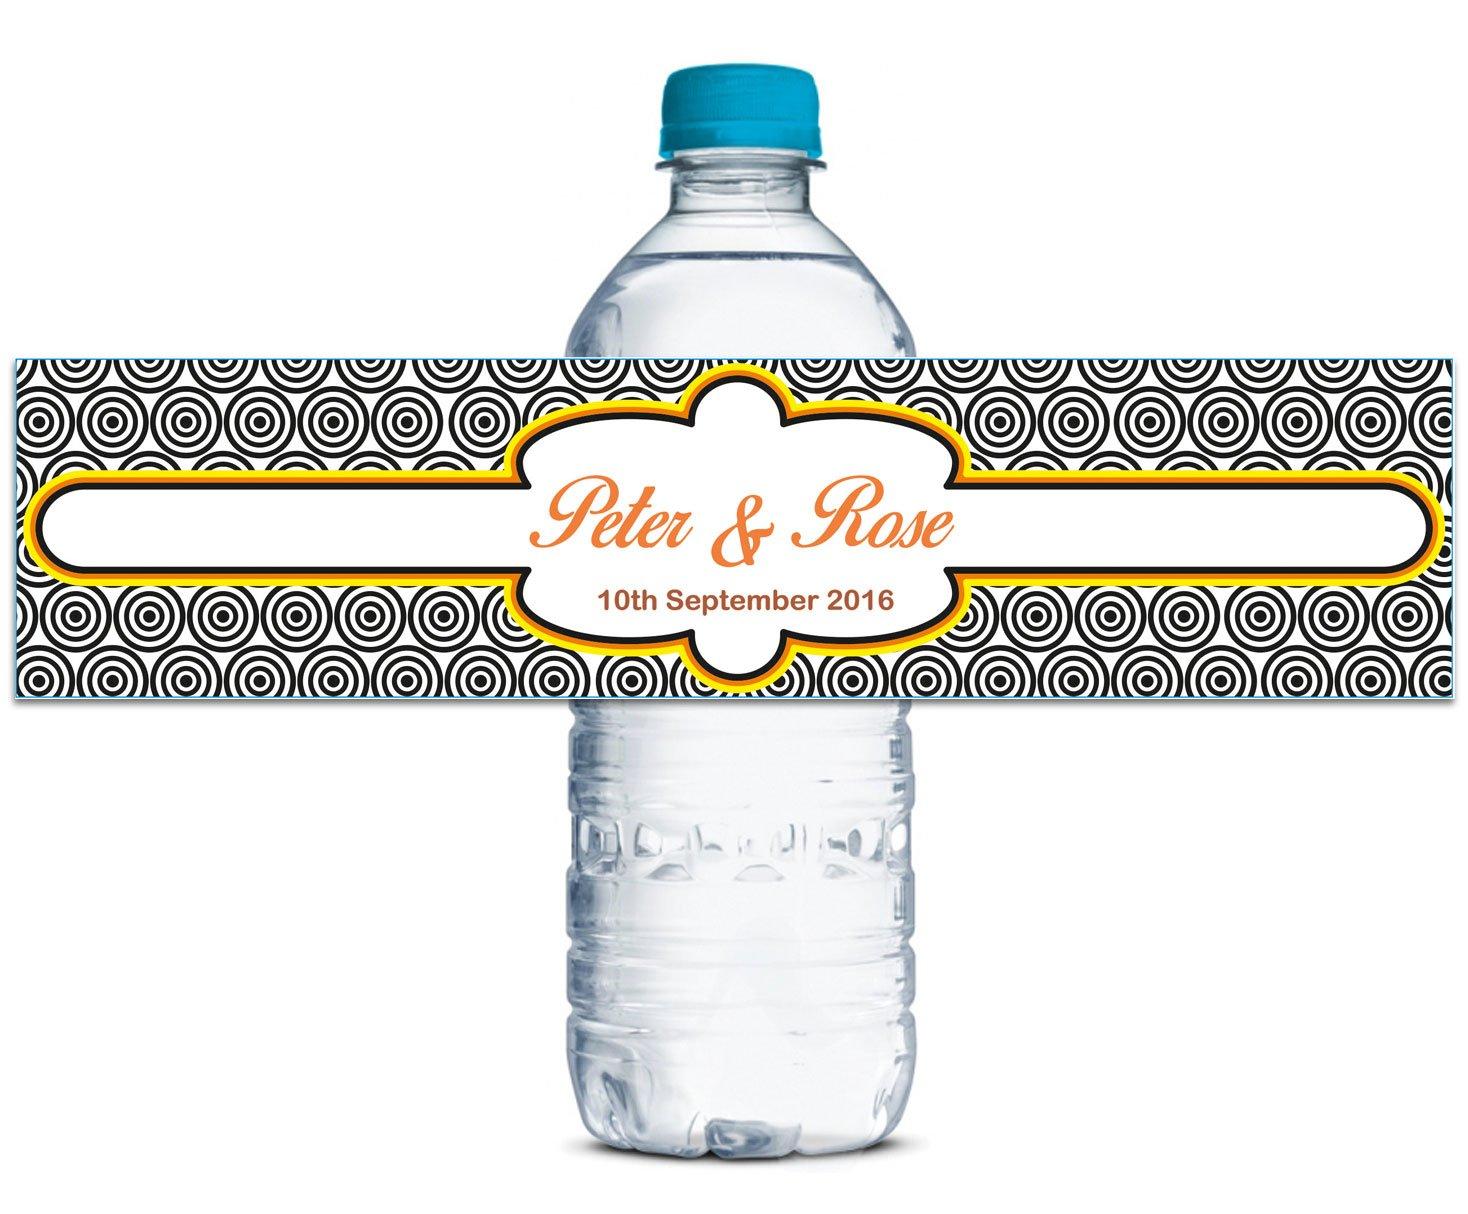 Wedding Water Bottle Label Personalized Stickers Stickers Stickers Custom Waterproof Adhesive Labels 8  x 2  Inches - 70 Labels B013UV8DSG | Viele Stile  8e4830